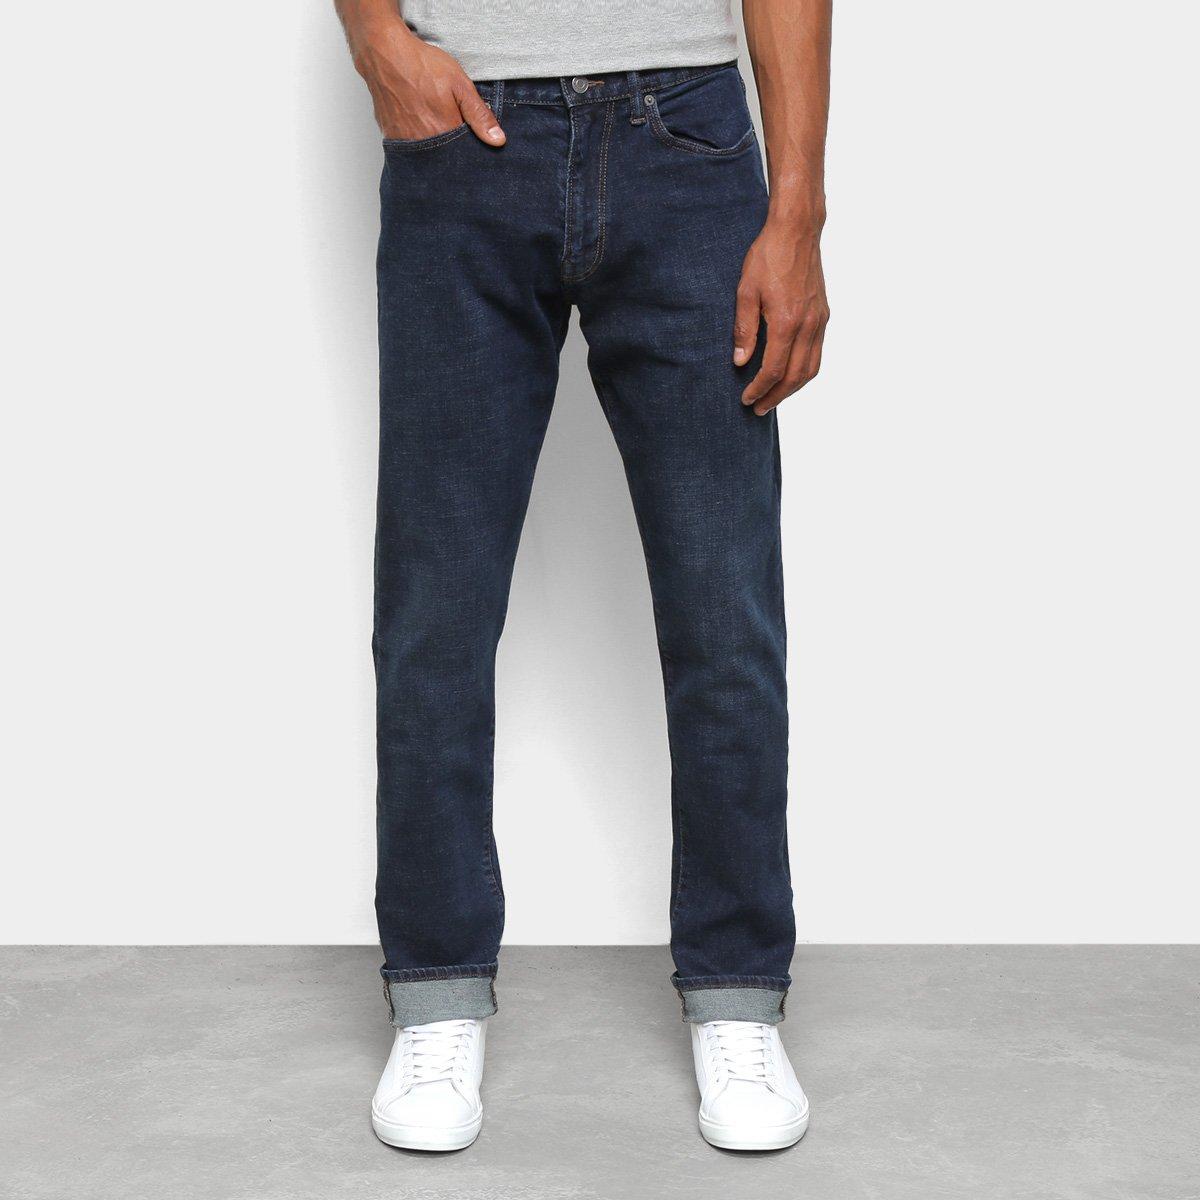 Calça Jeans GAP Reta Dobra Masculina